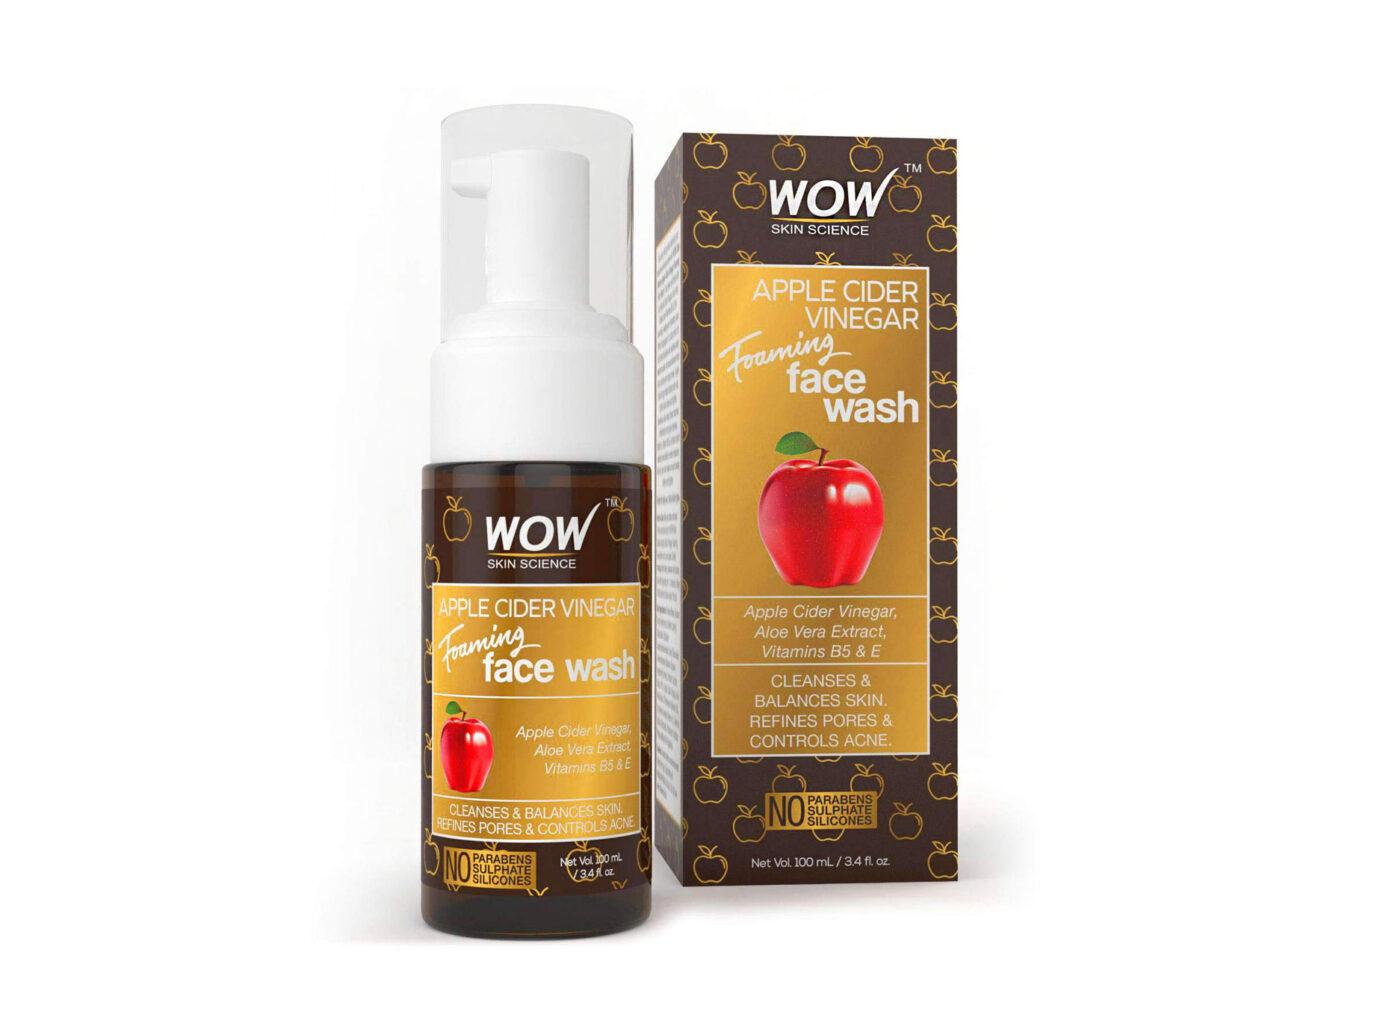 WOW Apple Cider Vinegar Foaming Face Wash Cleanser